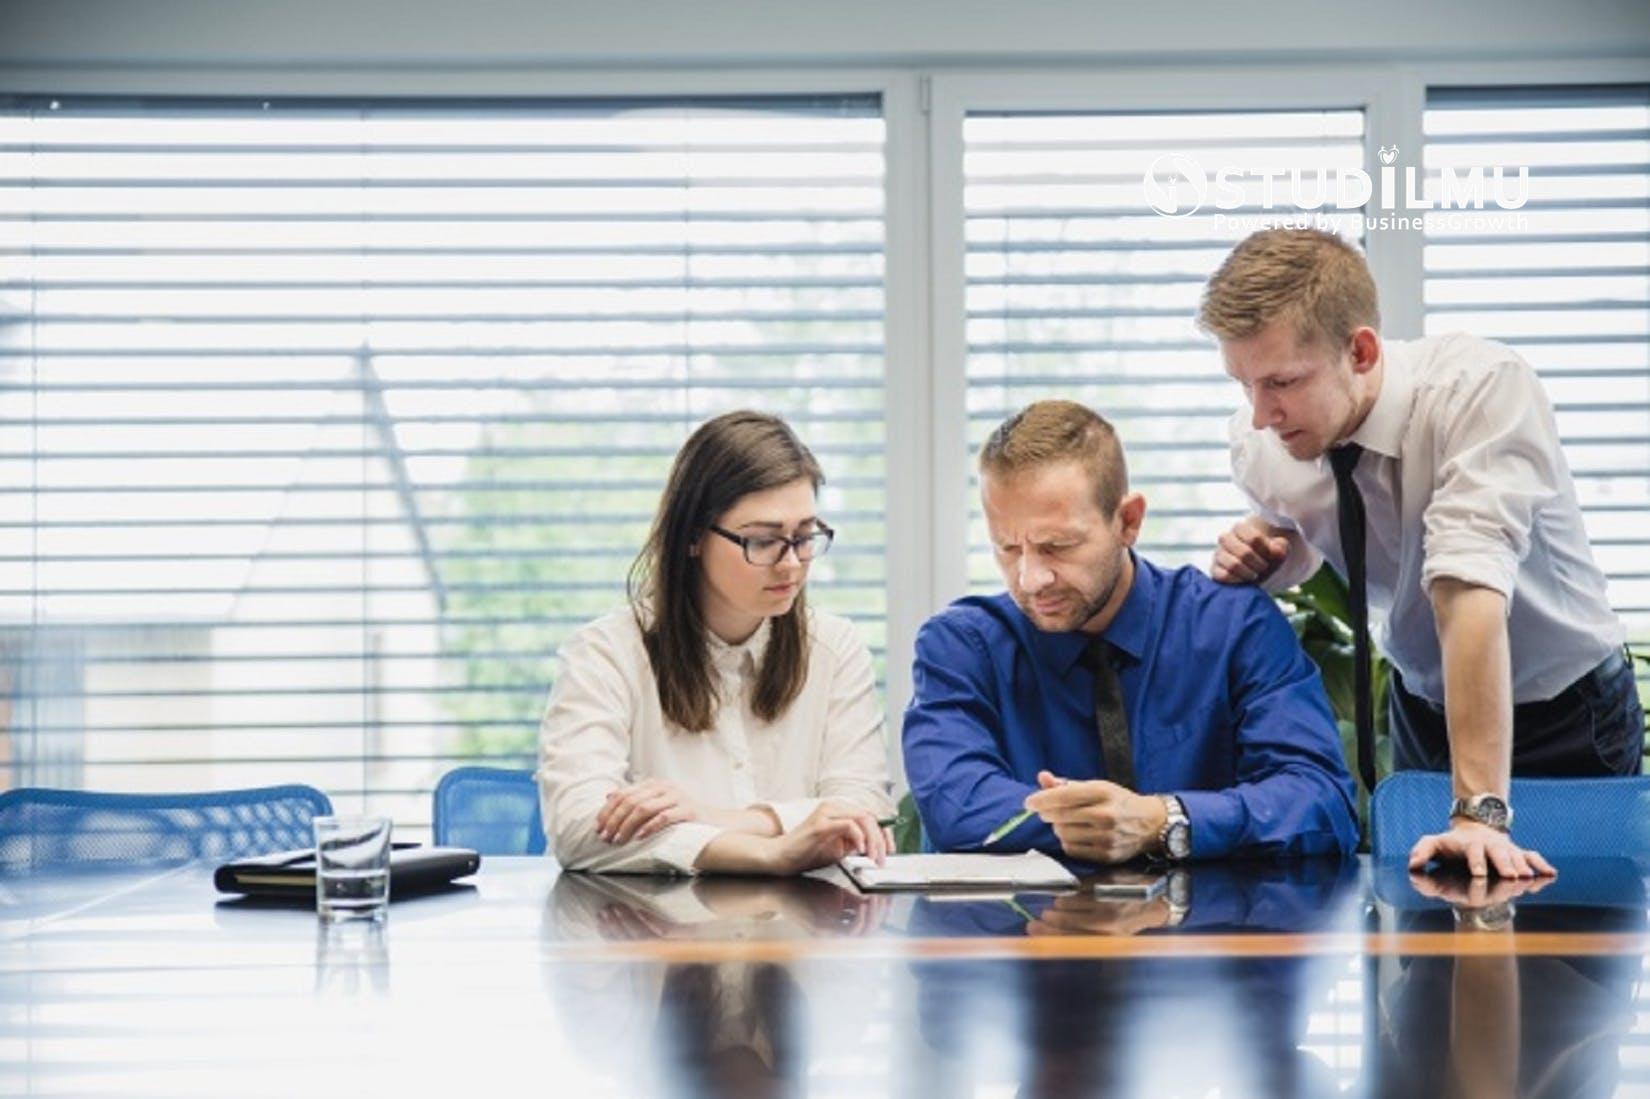 STUDILMU Career Advice - 10 Kiat Sikap Saling Menghargai di Lingkungan Kerja